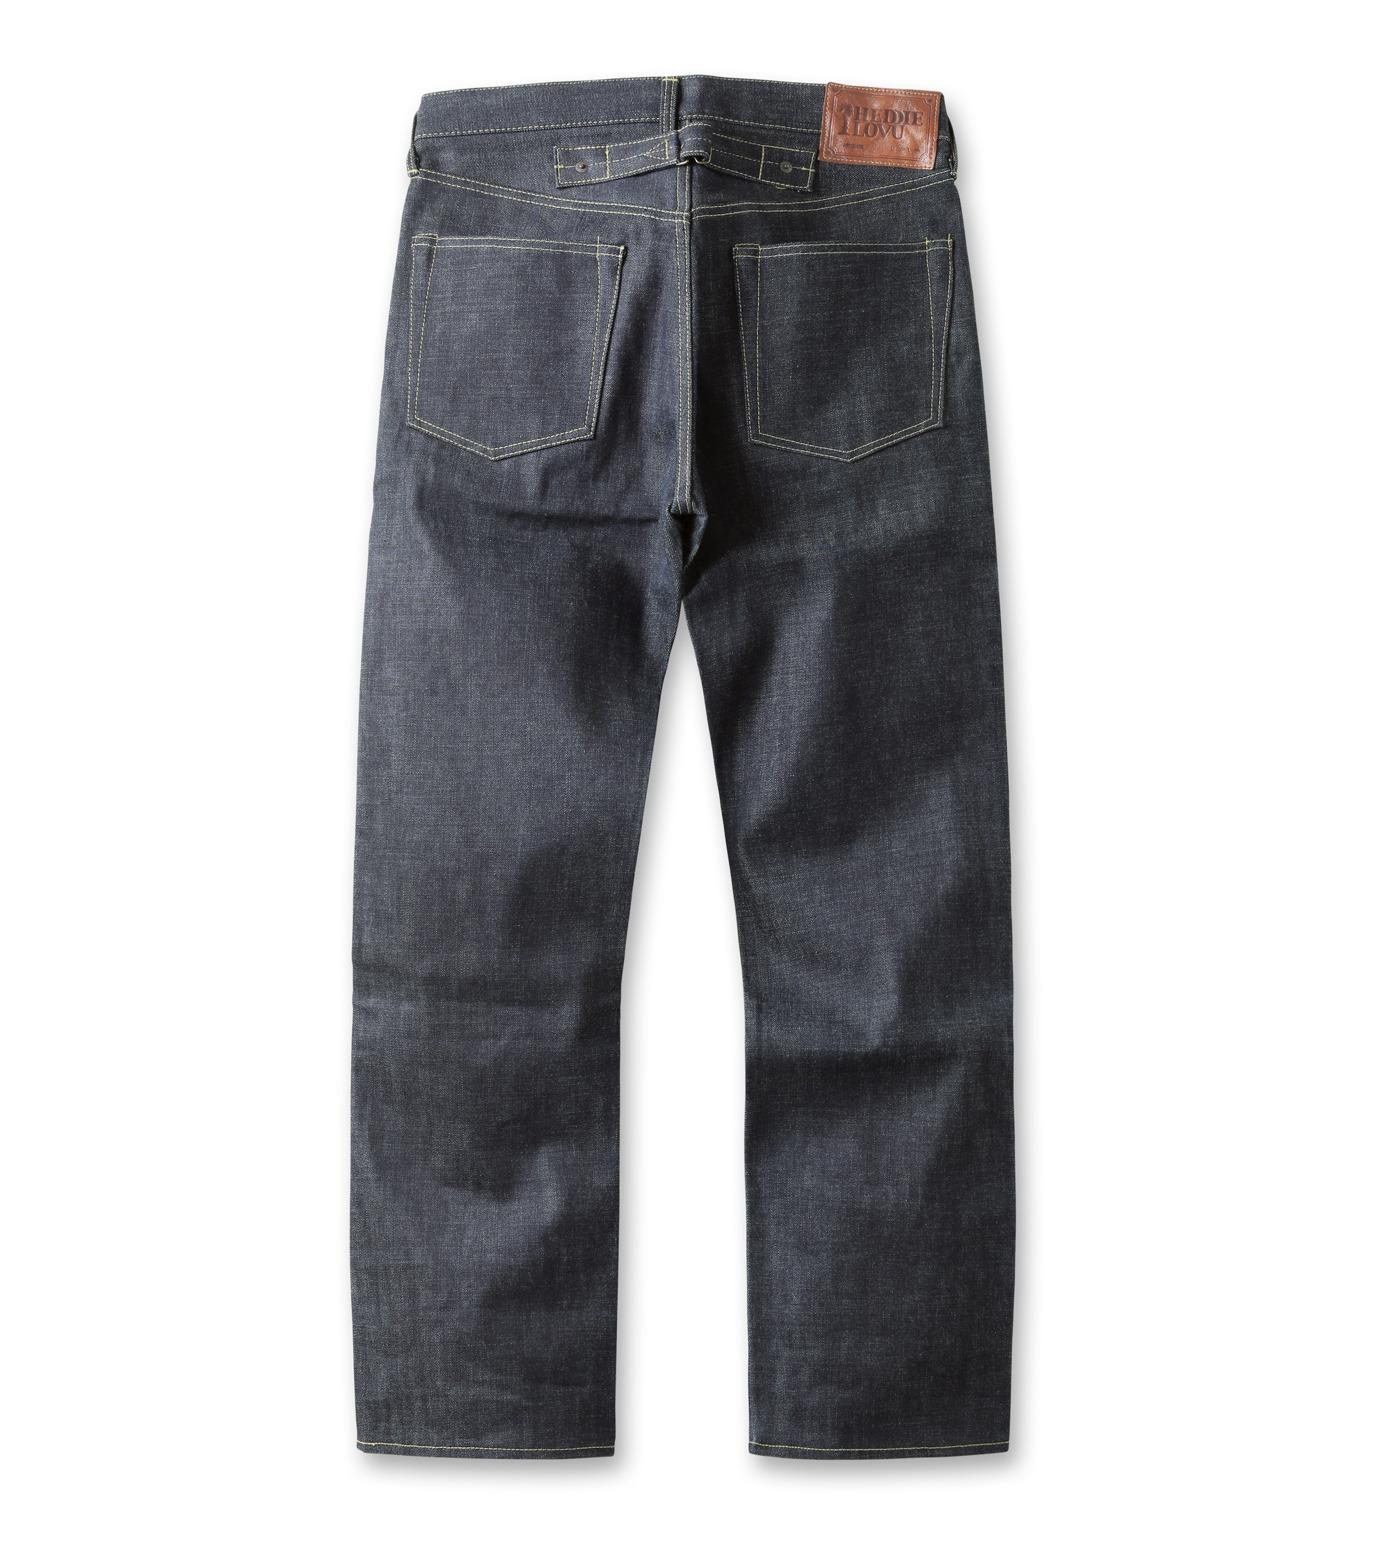 Heddie Lovu(エディー ルーヴ)のSPRUCE-NWS-INDIGO(パンツ/pants)-SPR-NWS-94 拡大詳細画像2